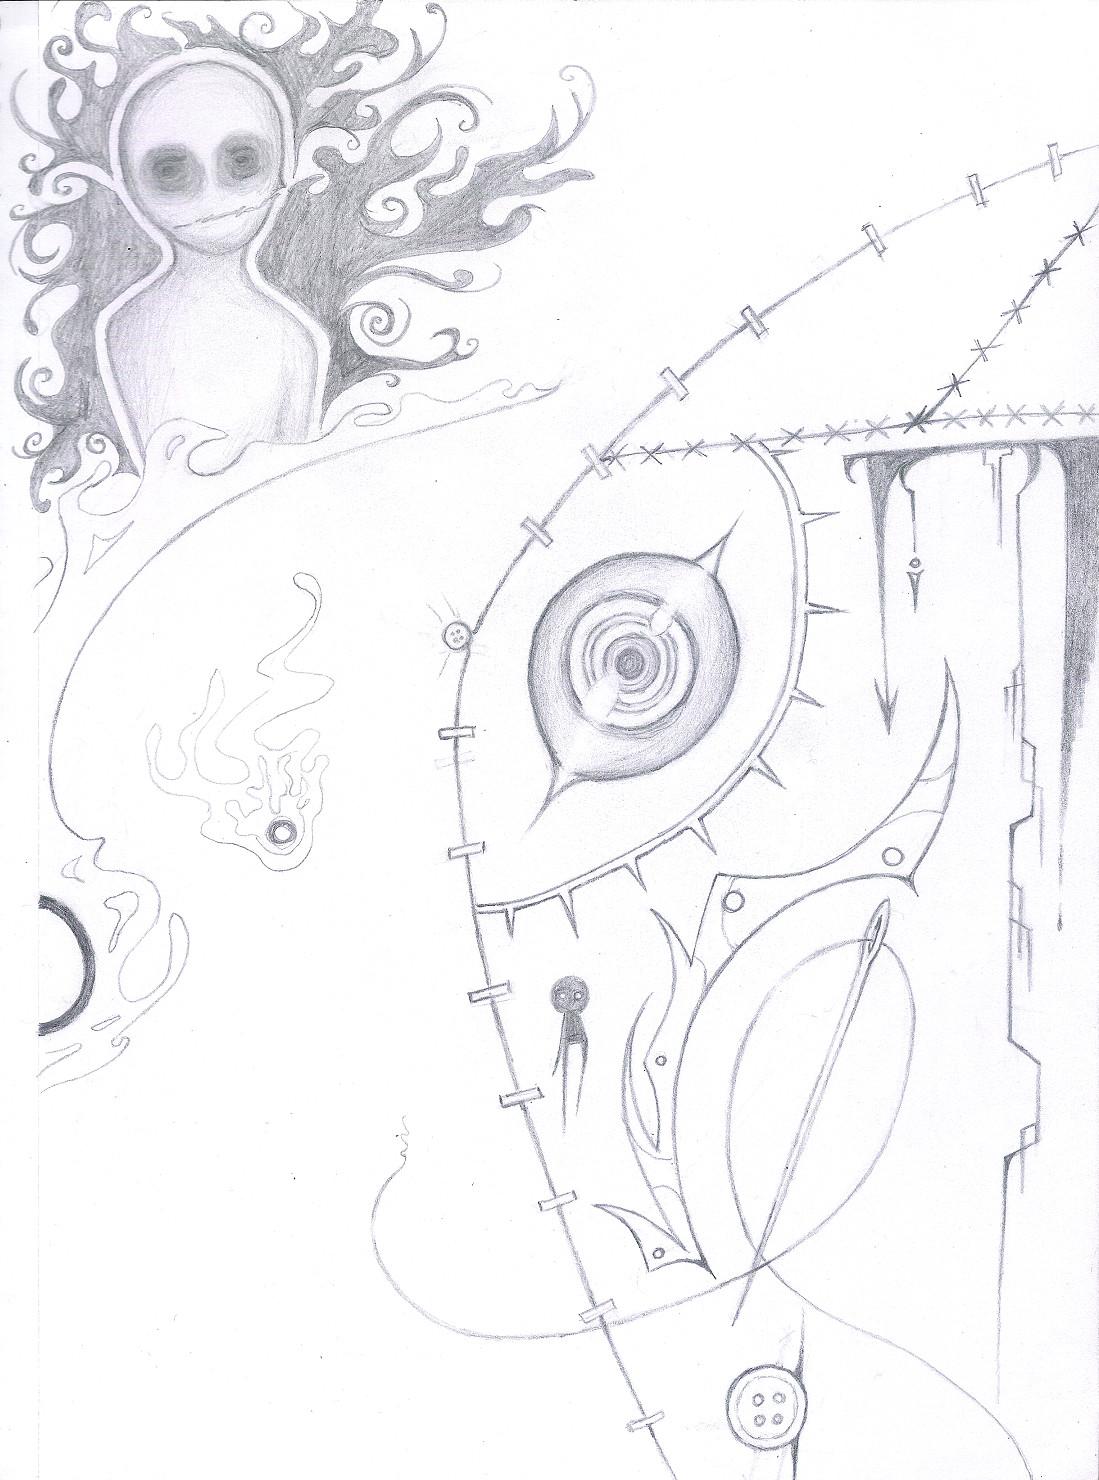 Horror page by ZeroMidnight